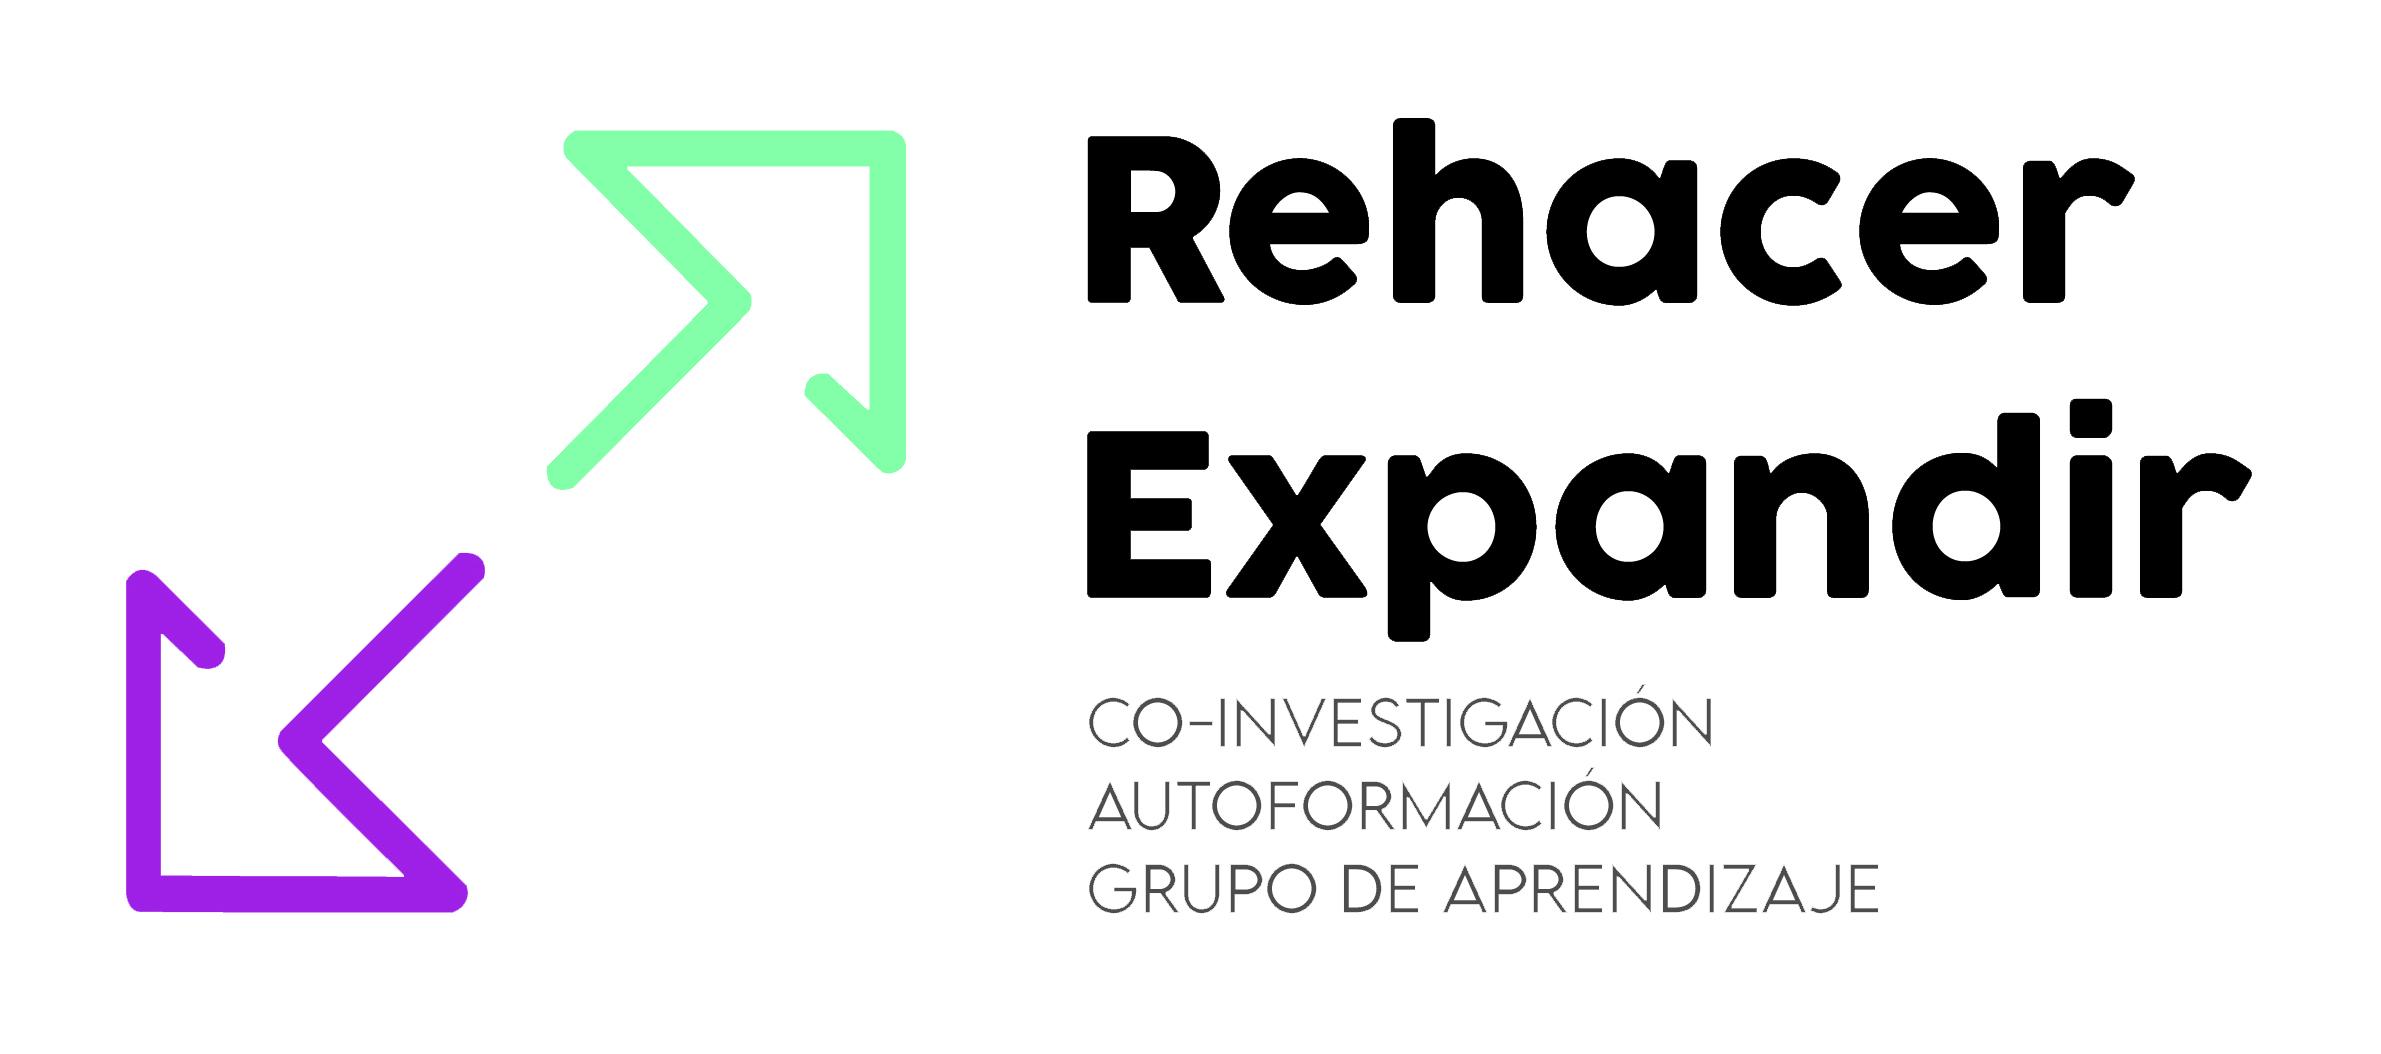 Logo rehacer y Expandir